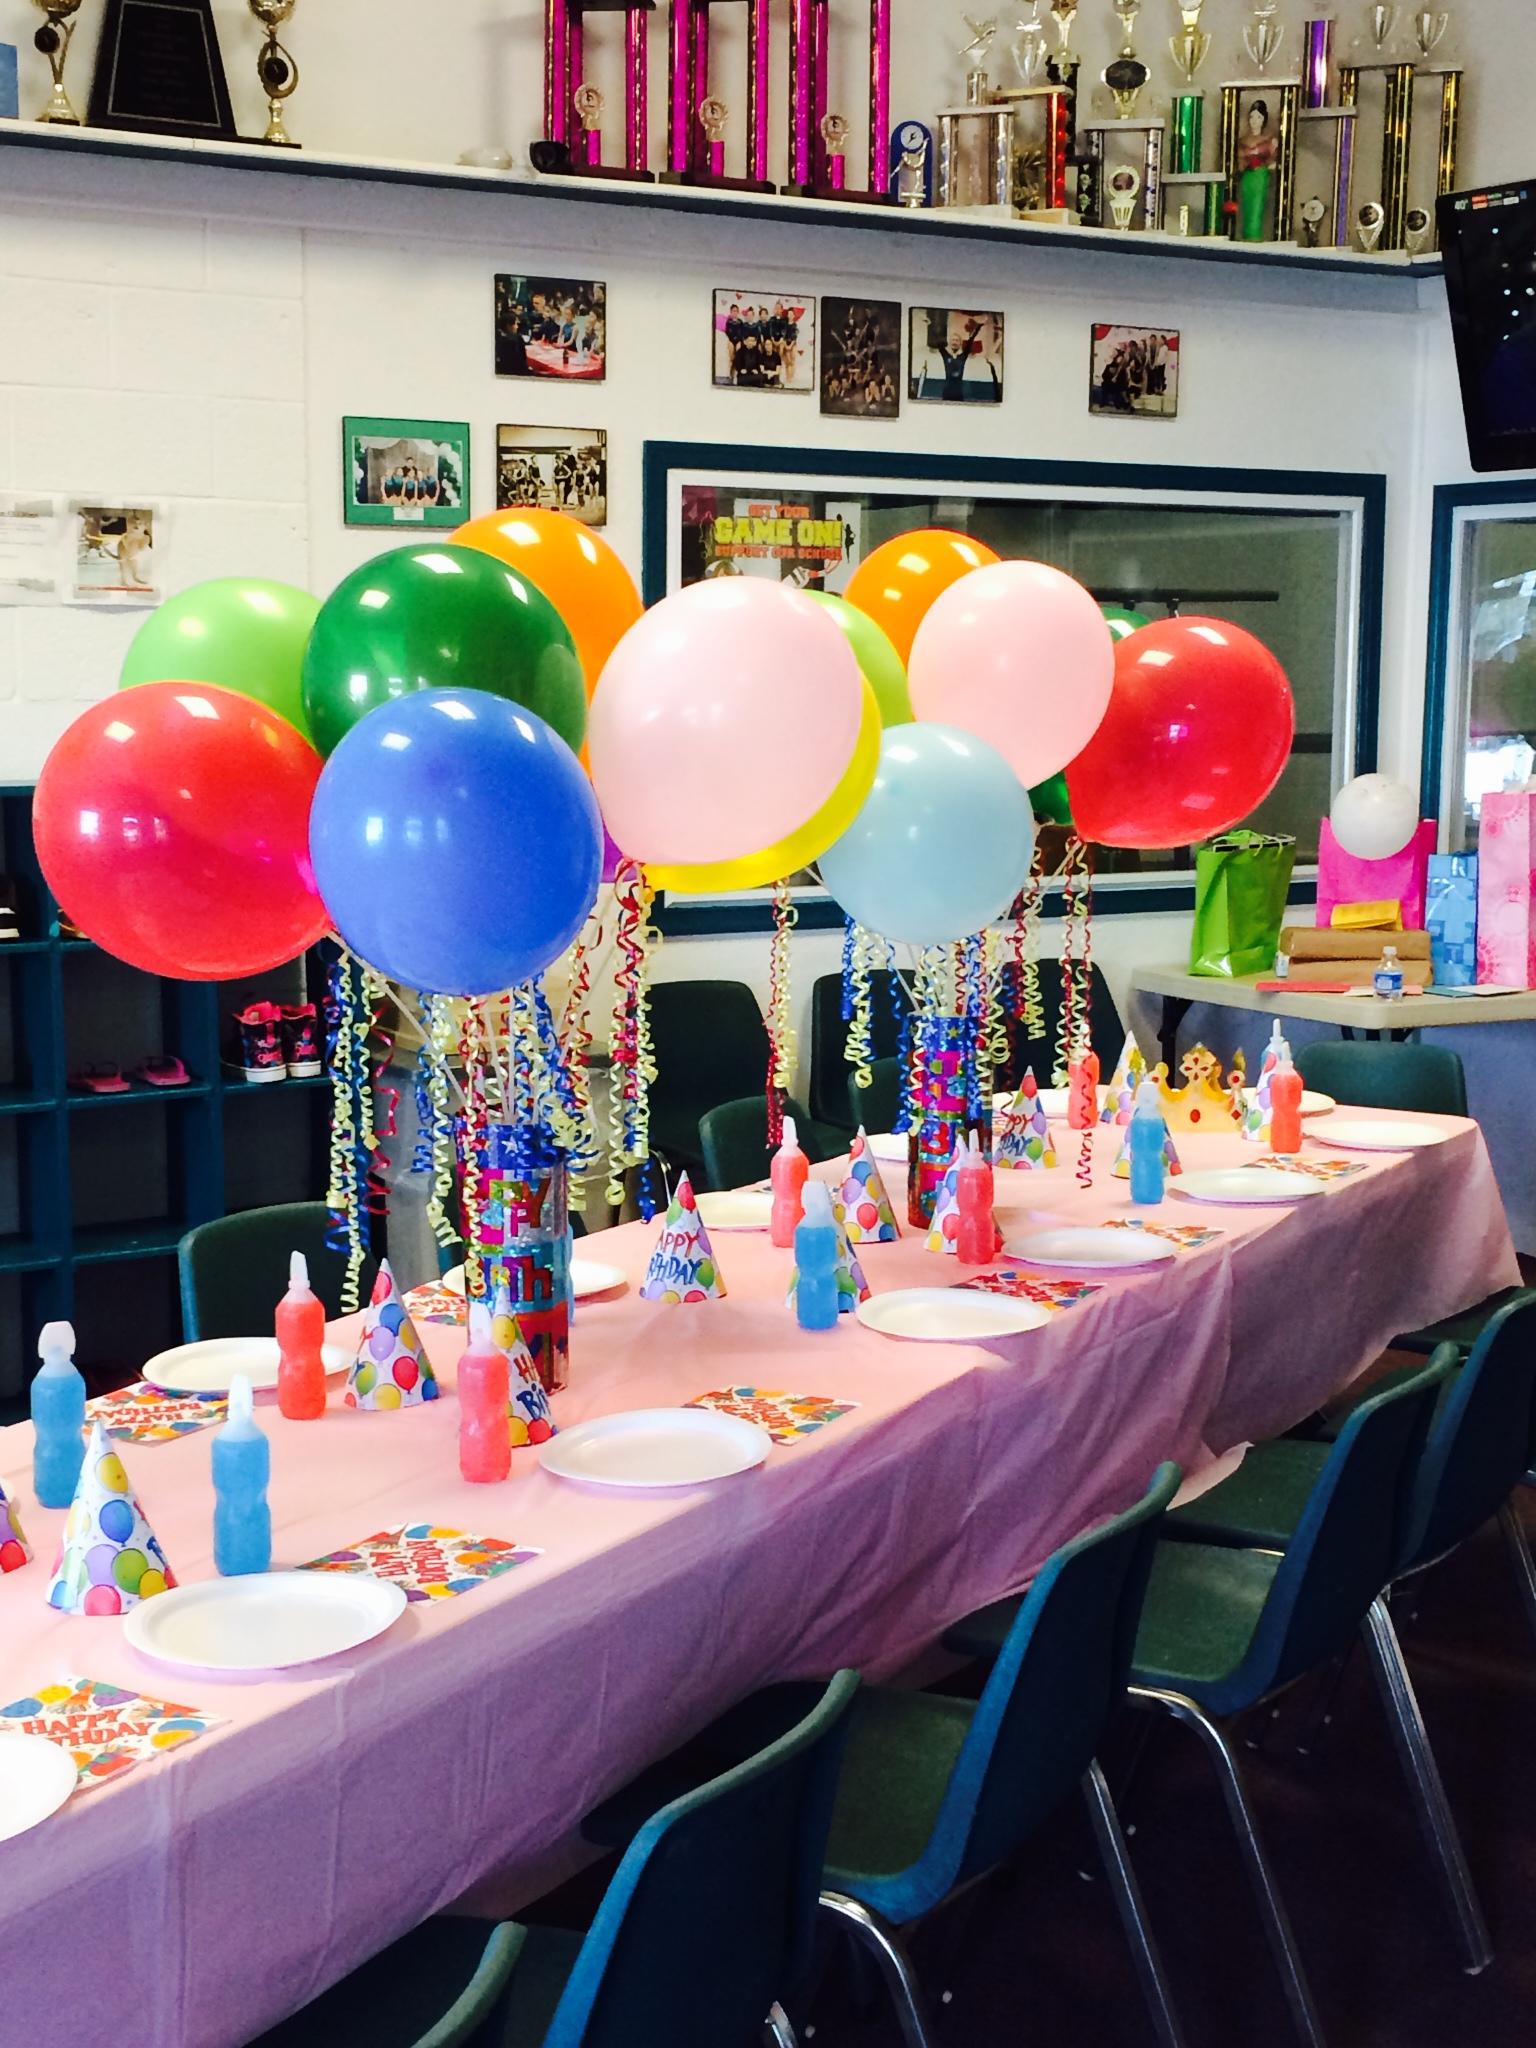 gymnastics birthday party Birthday Parties   Bensalem School of Gymnastics gymnastics birthday party